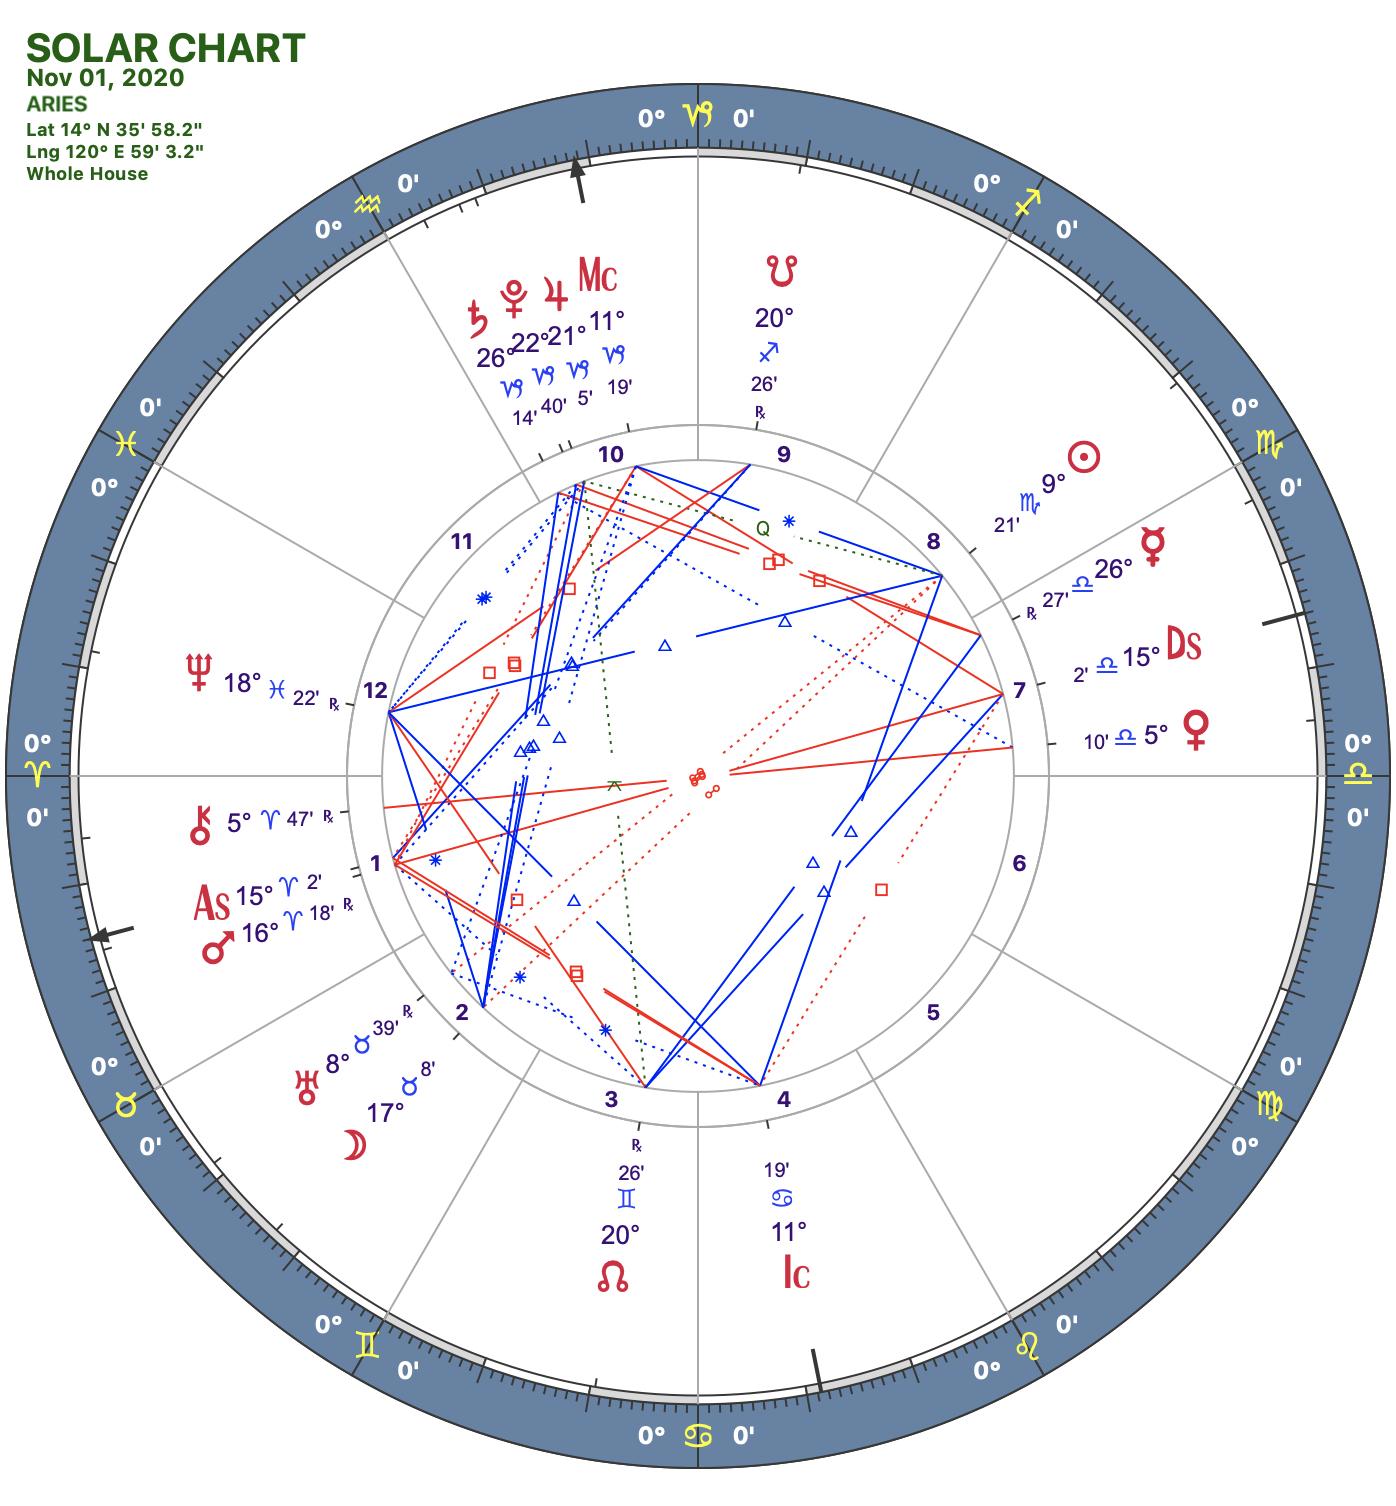 2020 11:Solar Chart:01 Aries